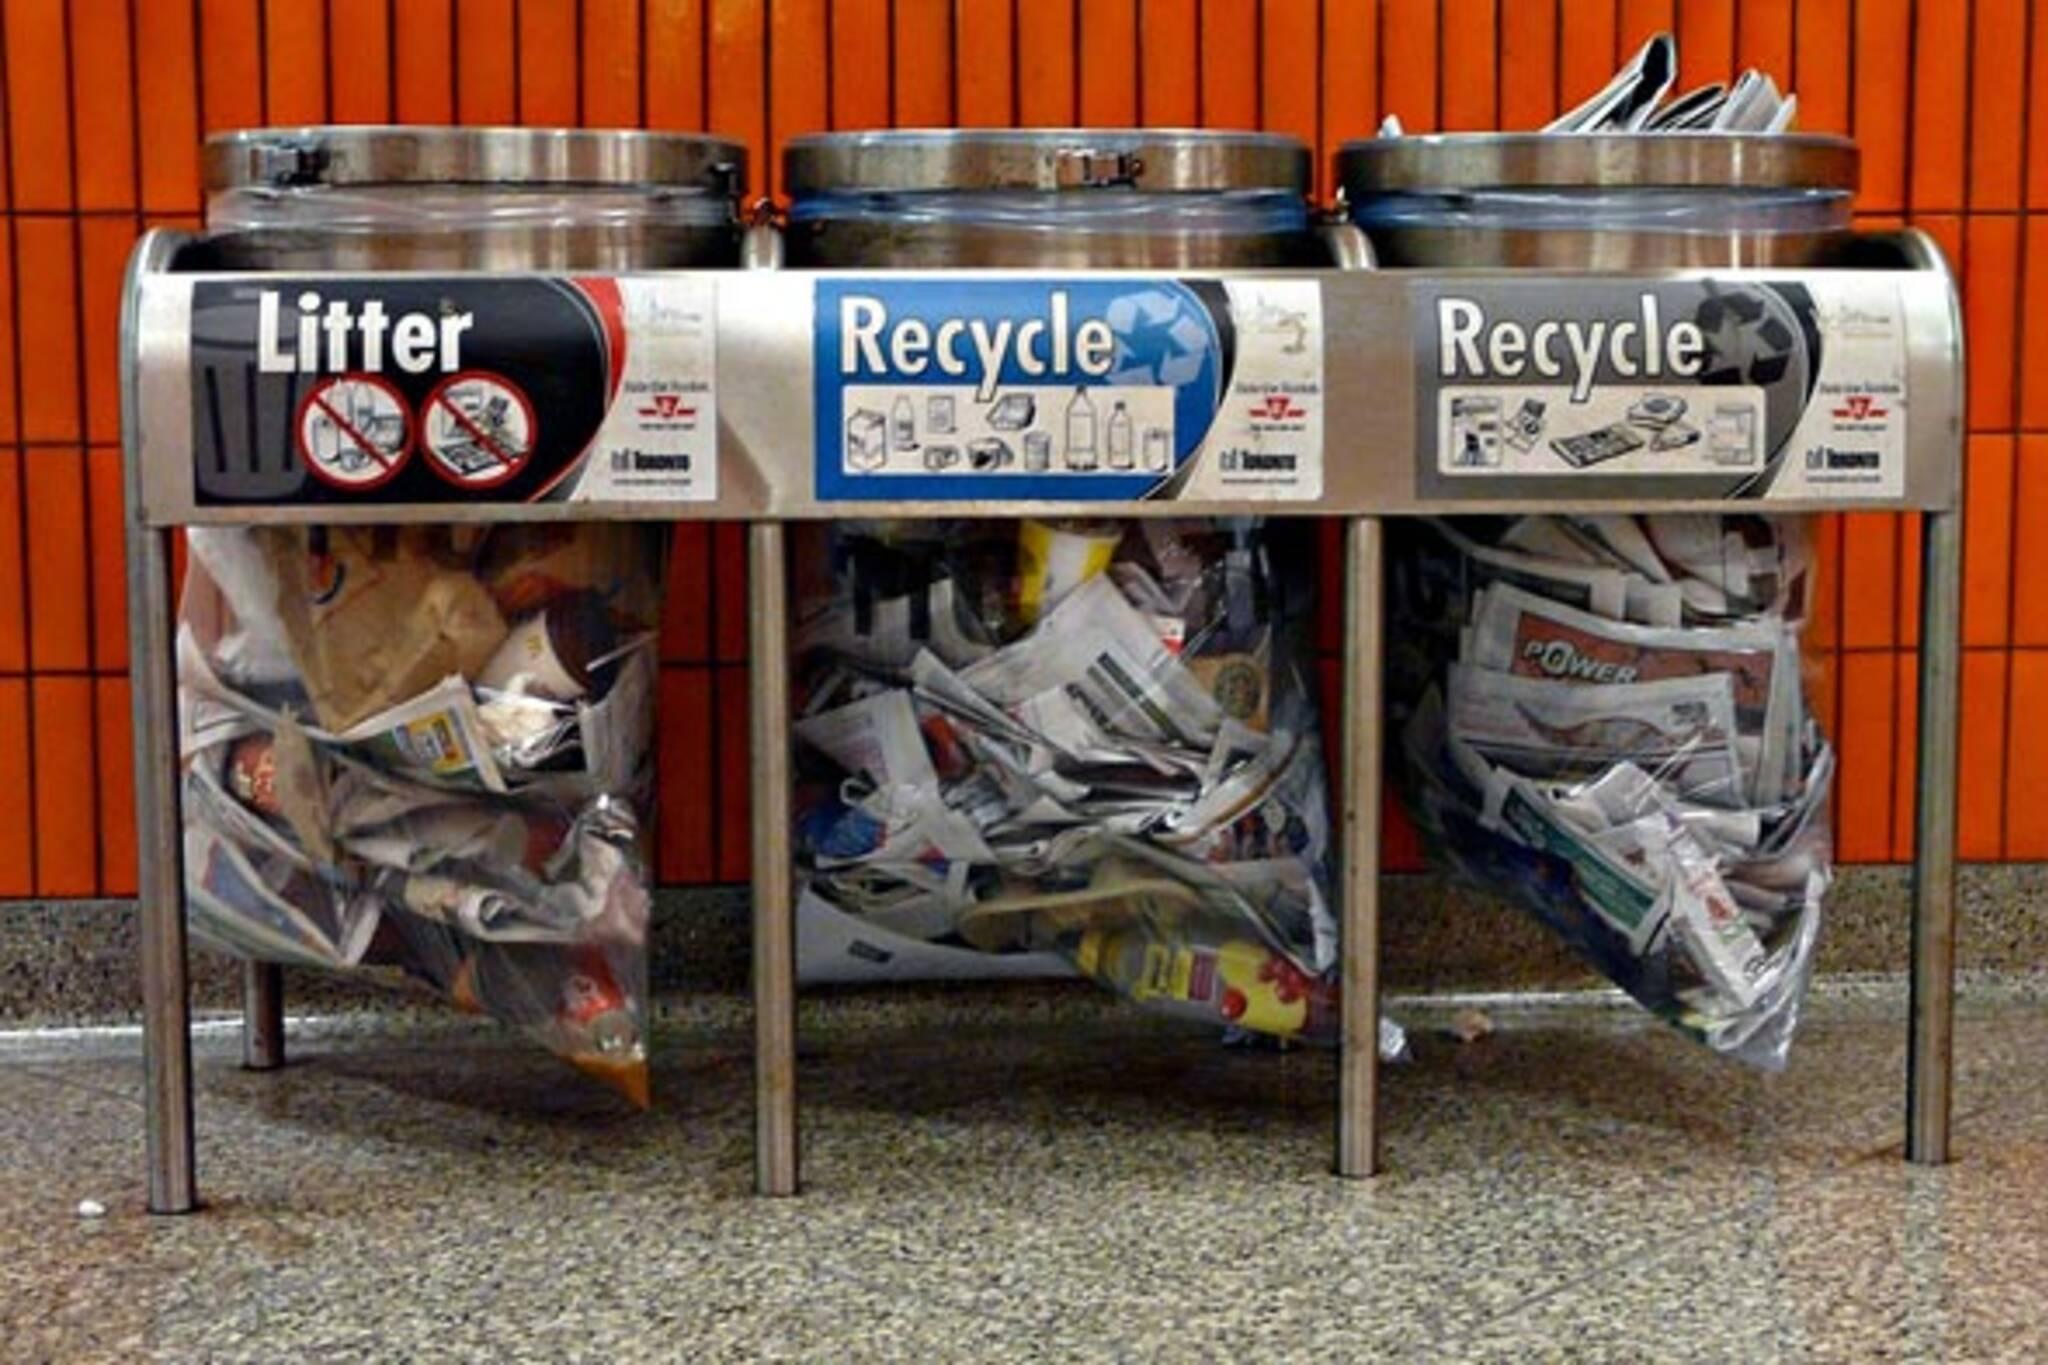 ttc toronto recycling apathy